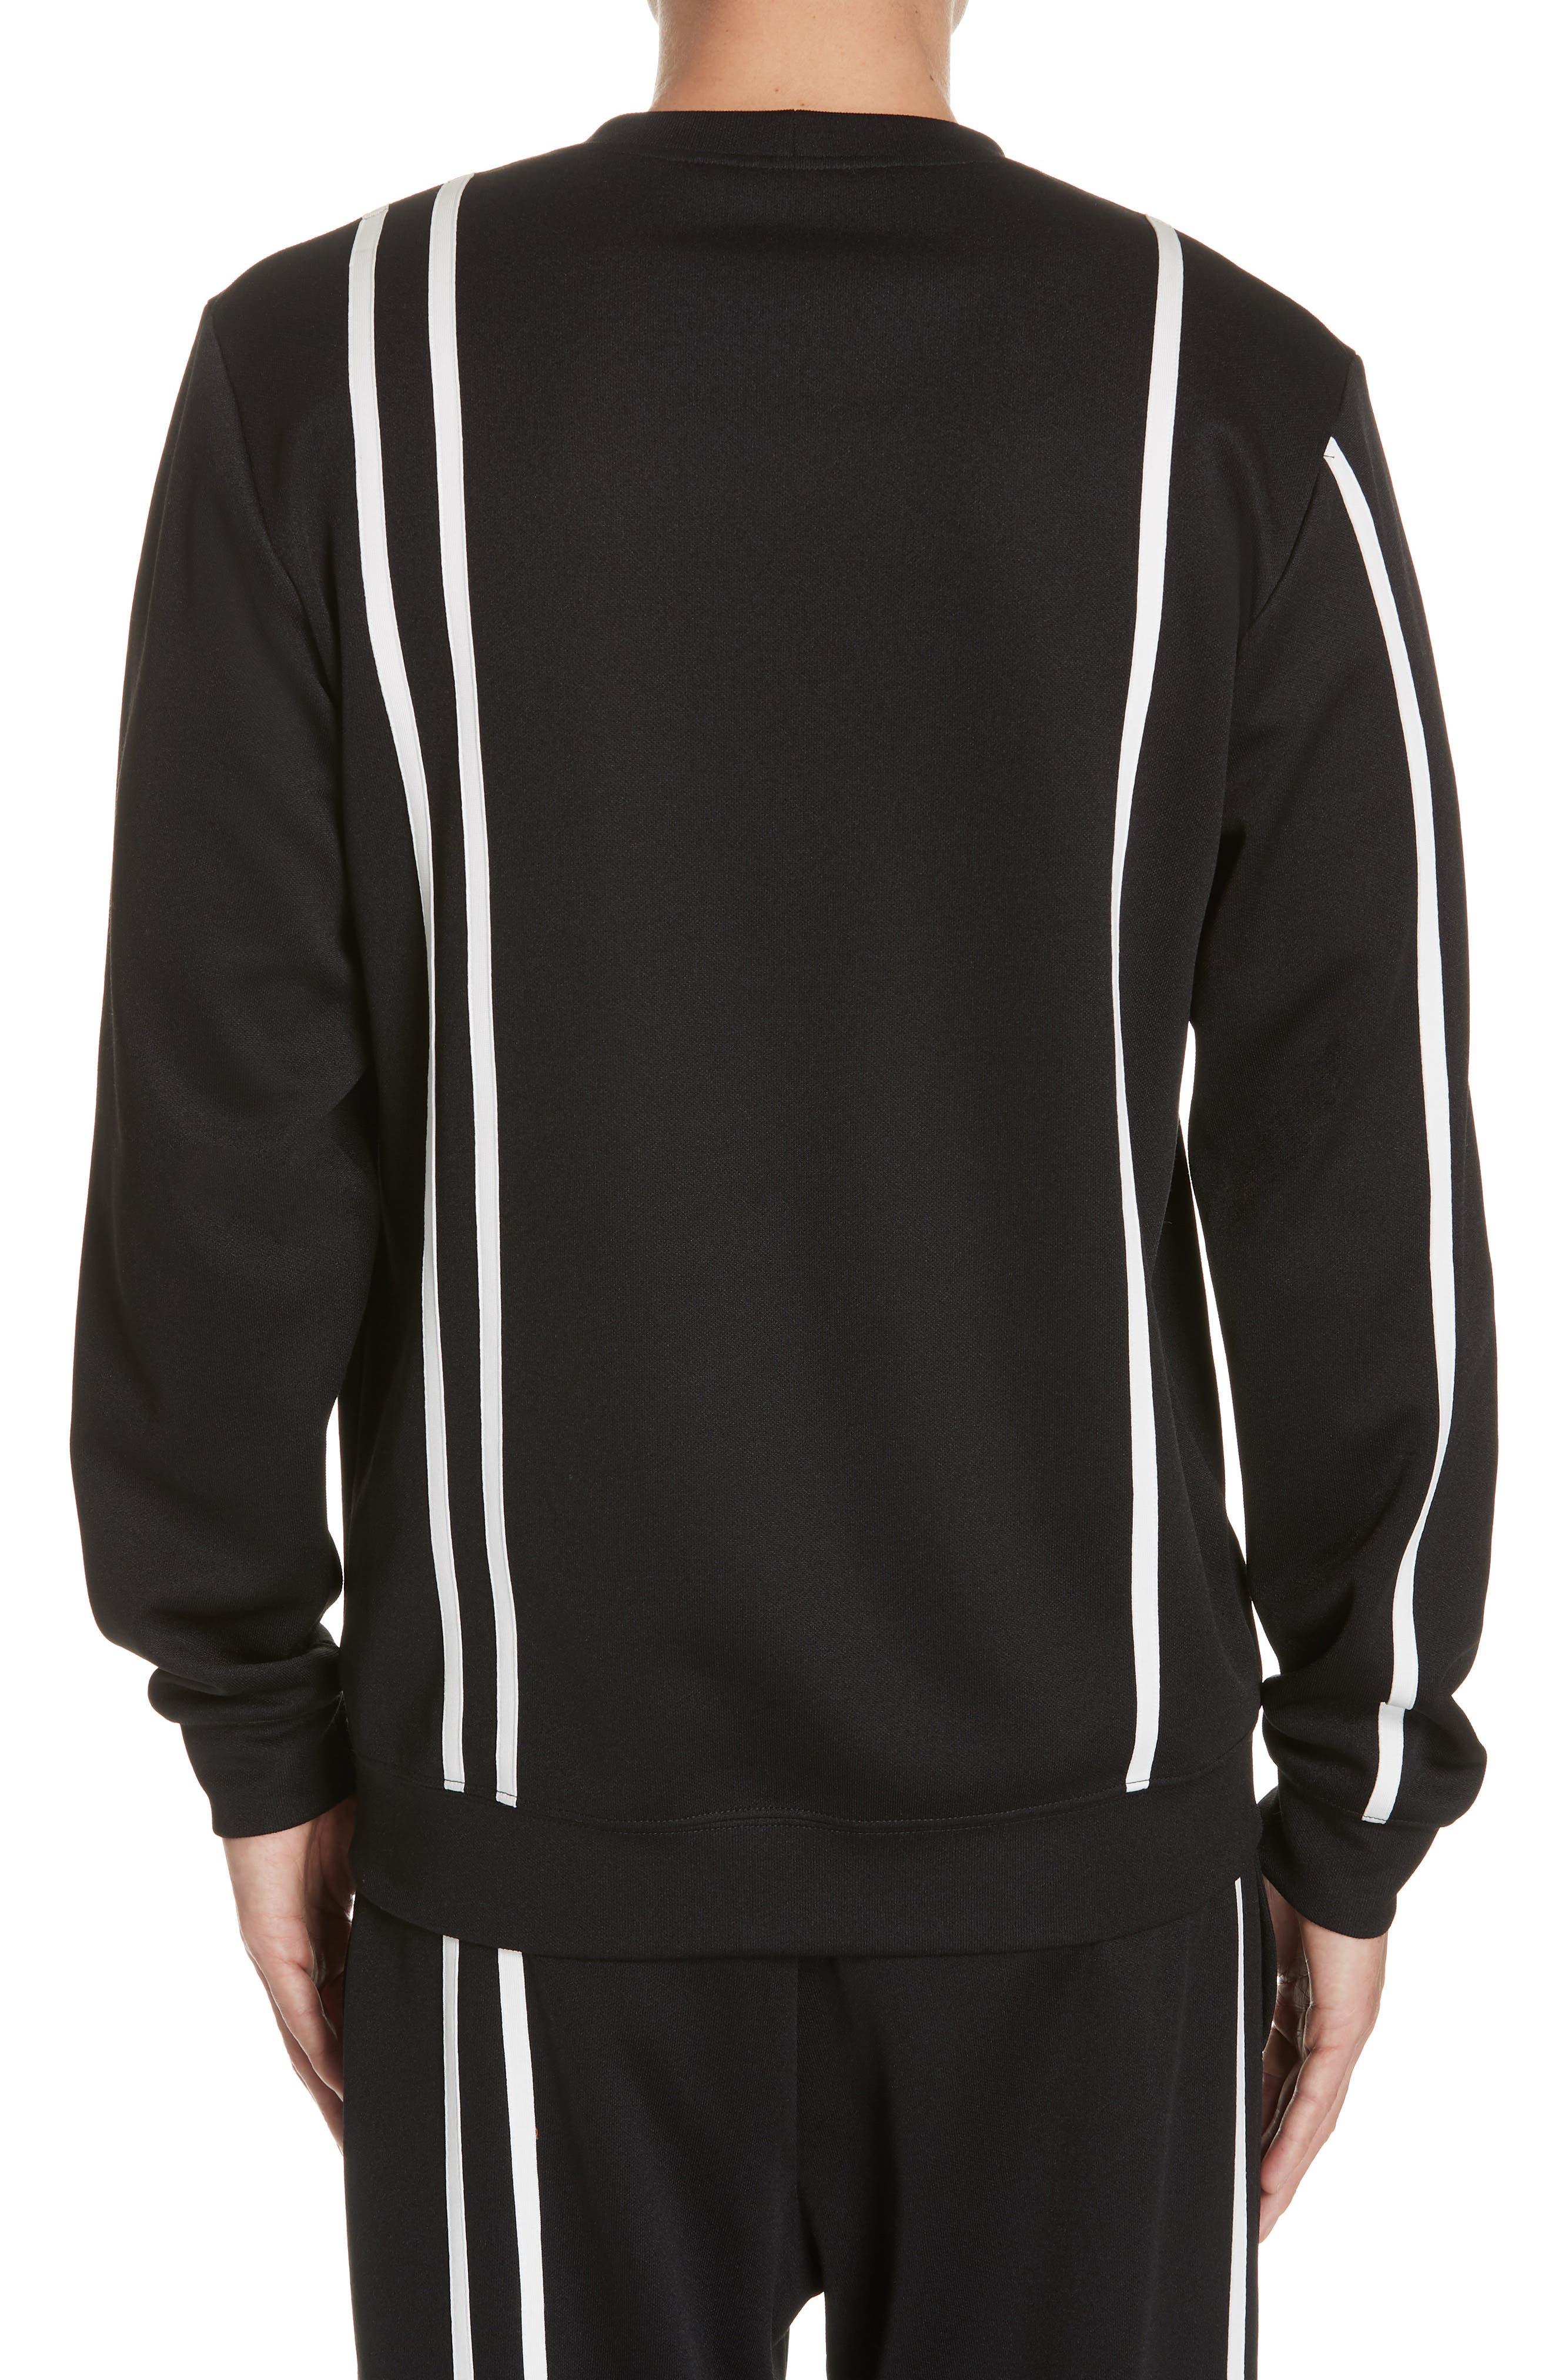 HELMUT LANG,                             Sport Stripe Print Sweatshirt,                             Alternate thumbnail 2, color,                             BLACK AND WHITE